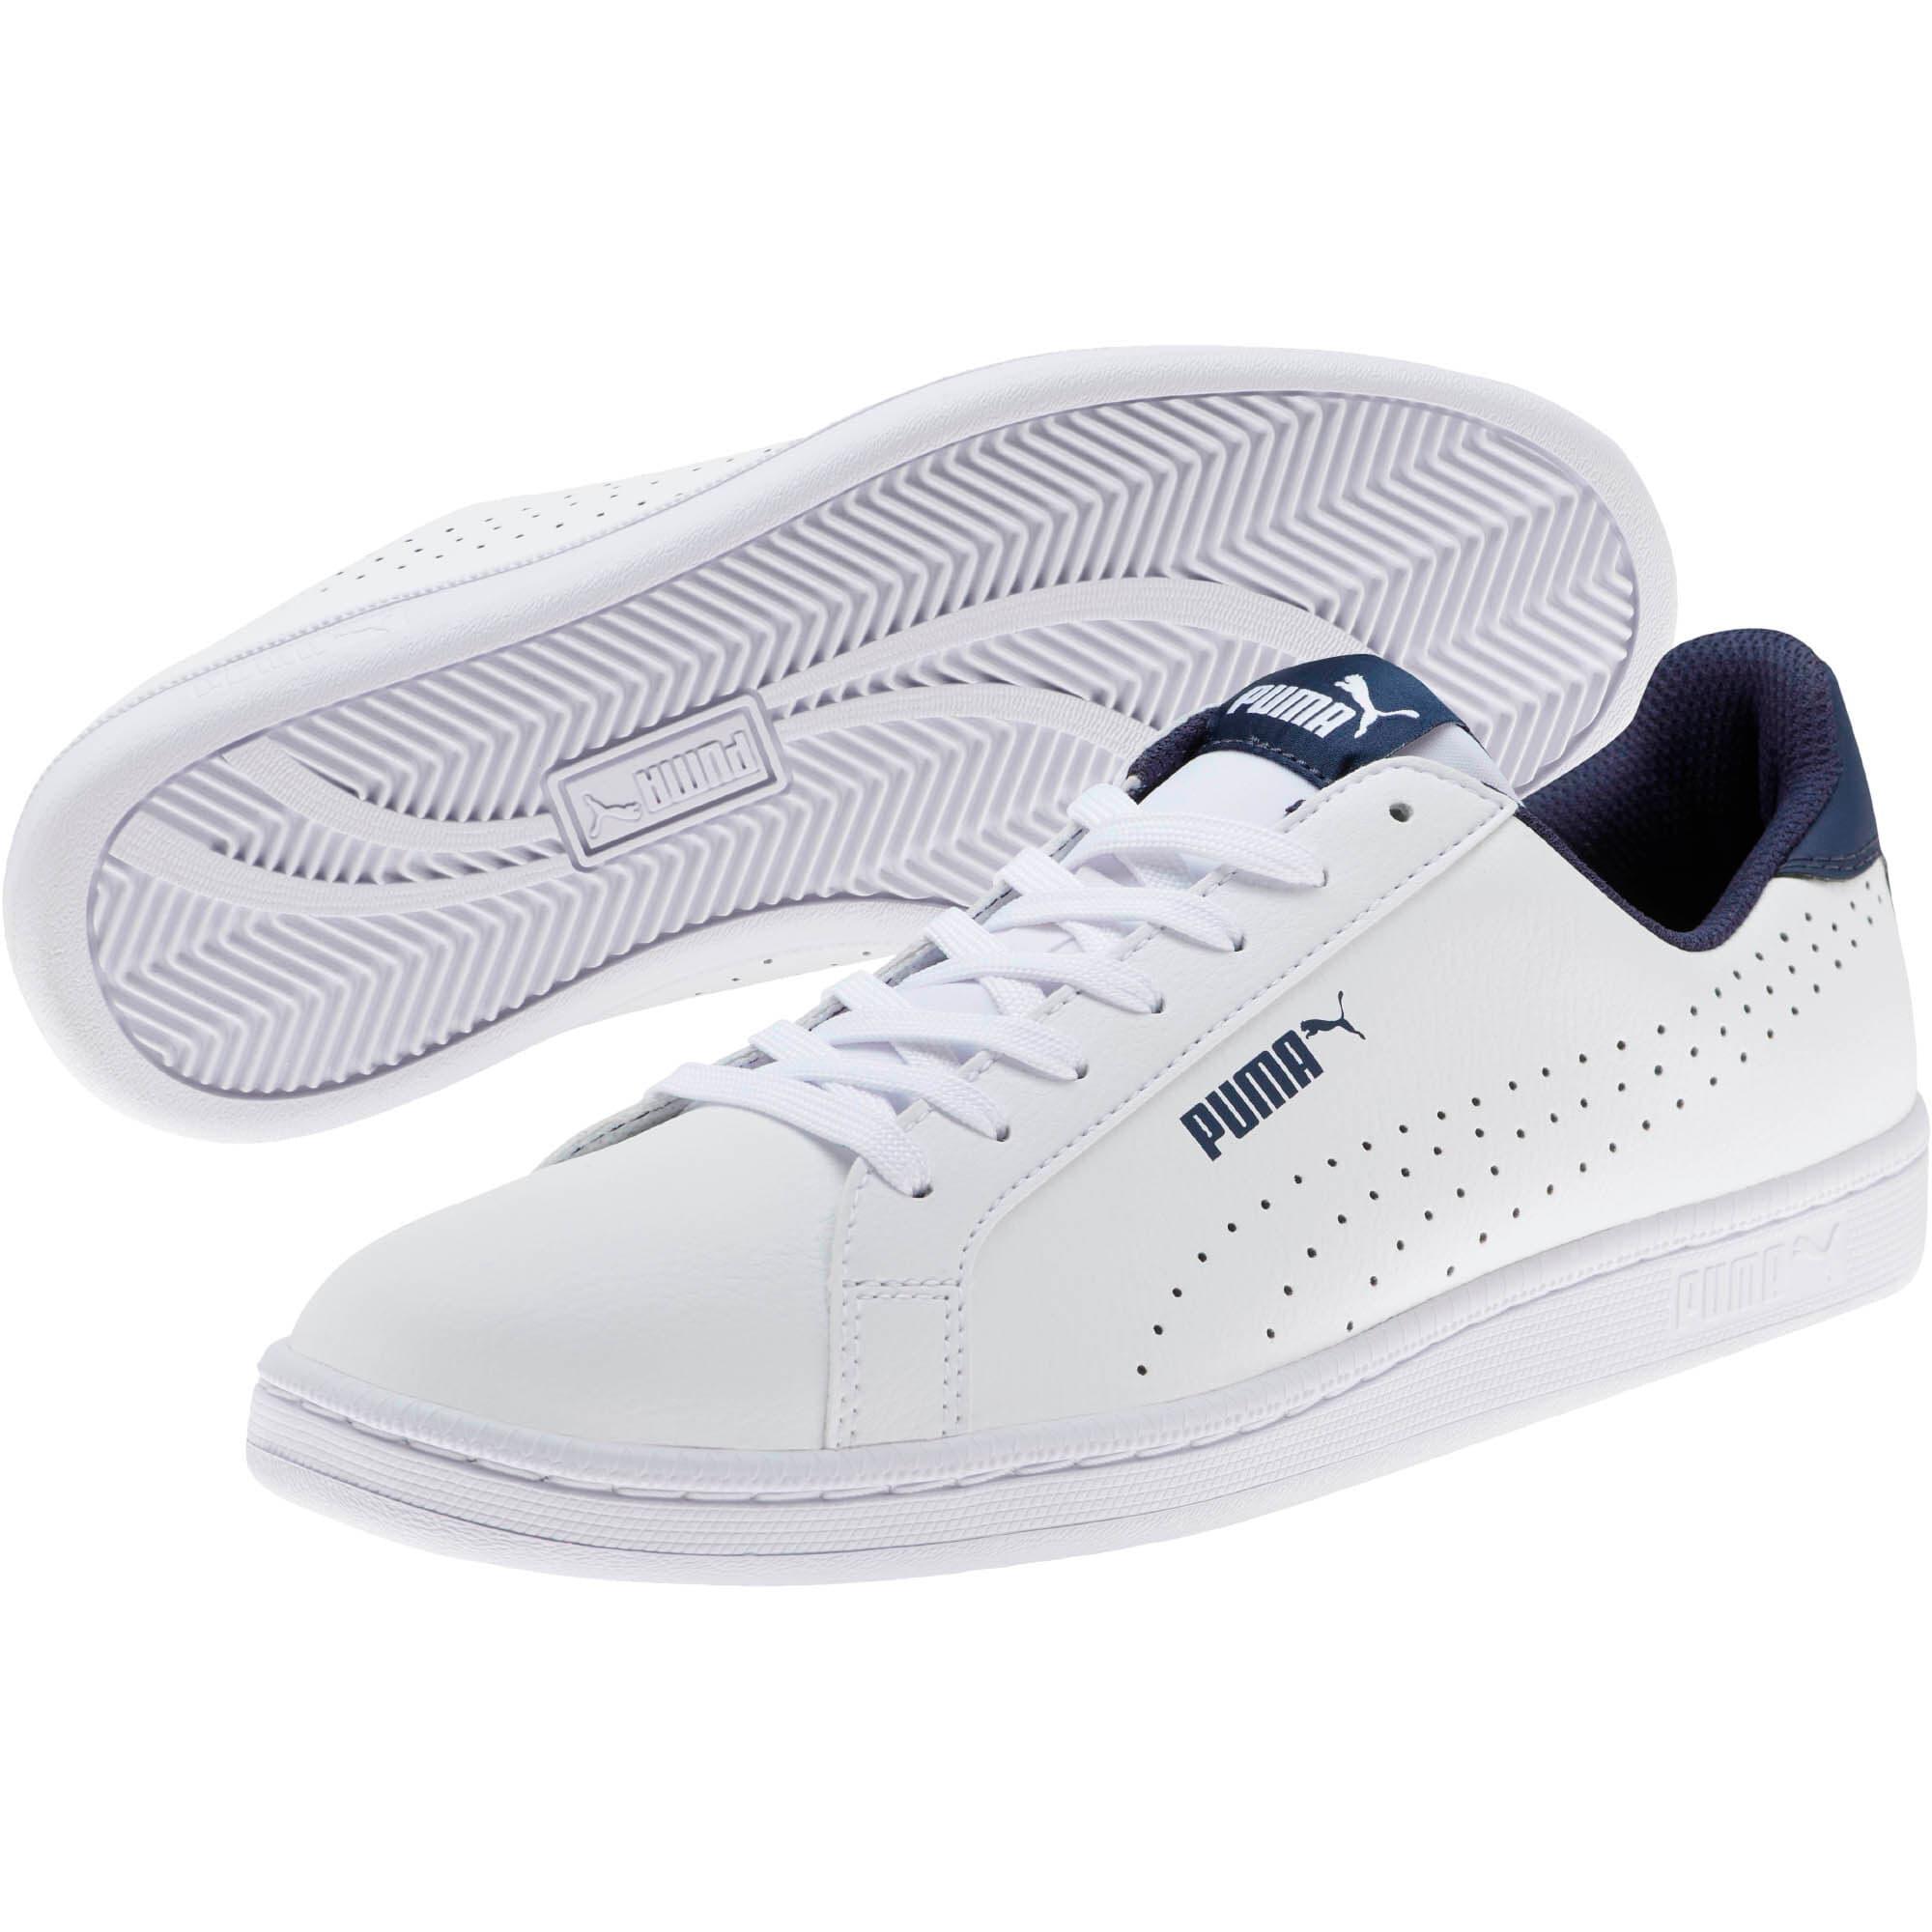 Thumbnail 2 of PUMA Smash Perf Sneakers, Puma White-Peacoat, medium